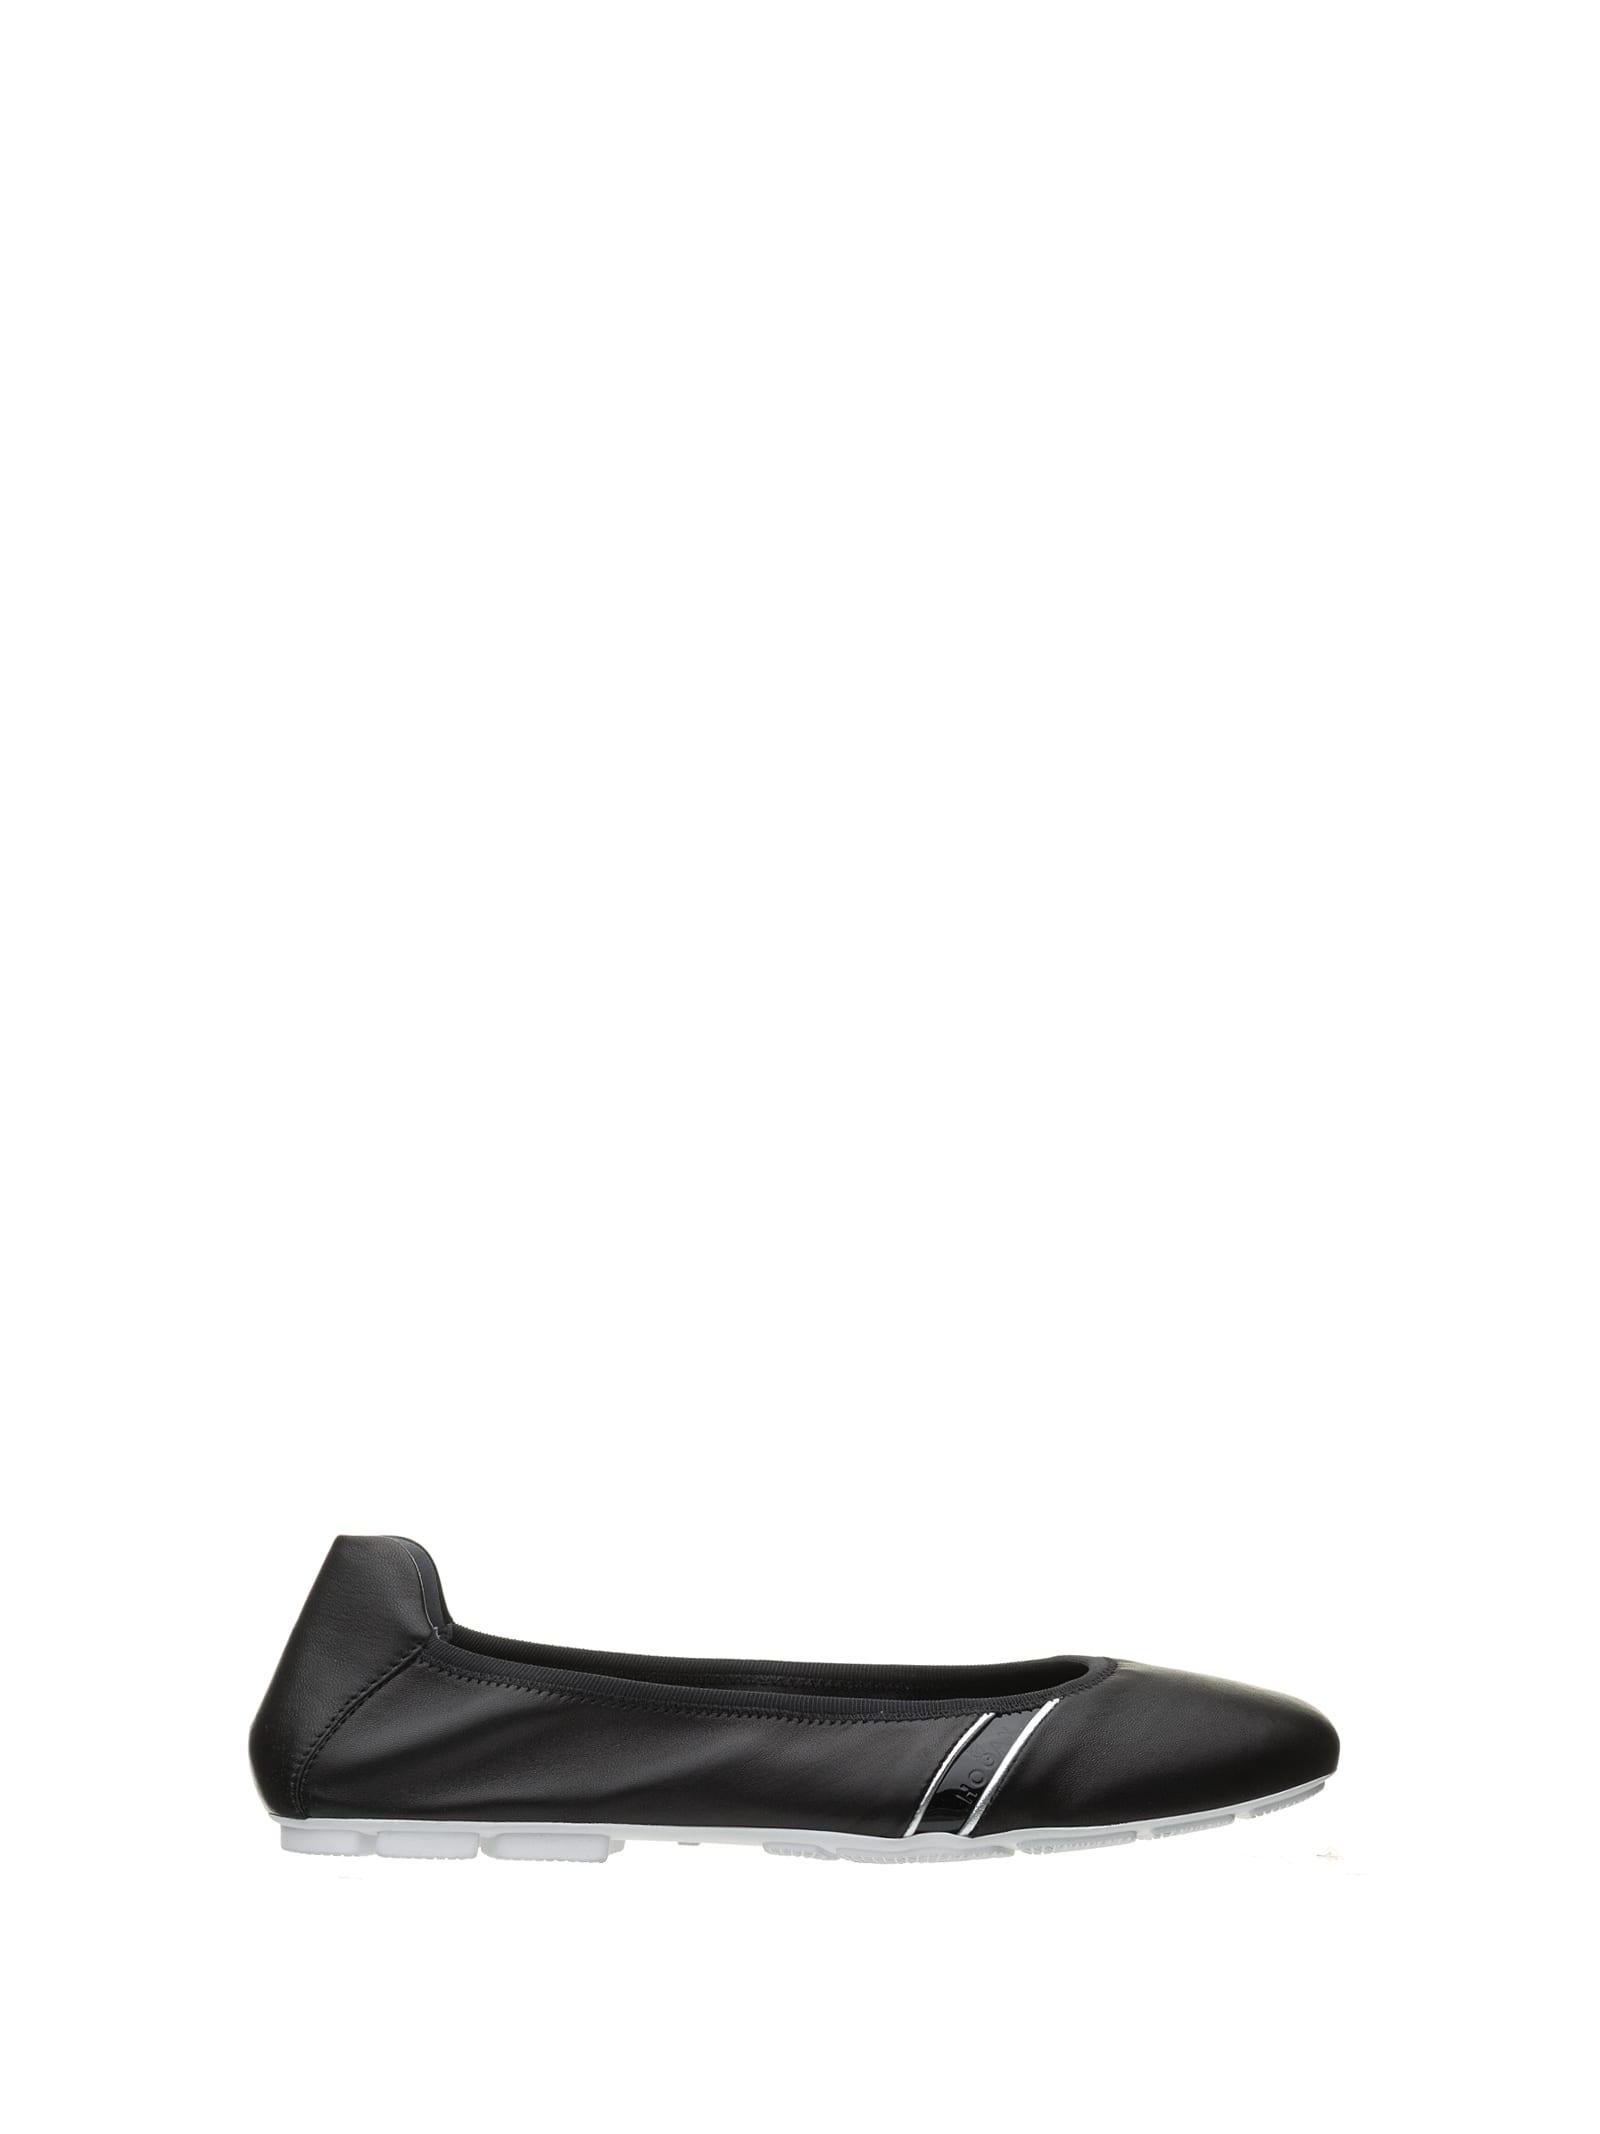 Hogan Flat Shoes | italist, ALWAYS LIKE A SALE